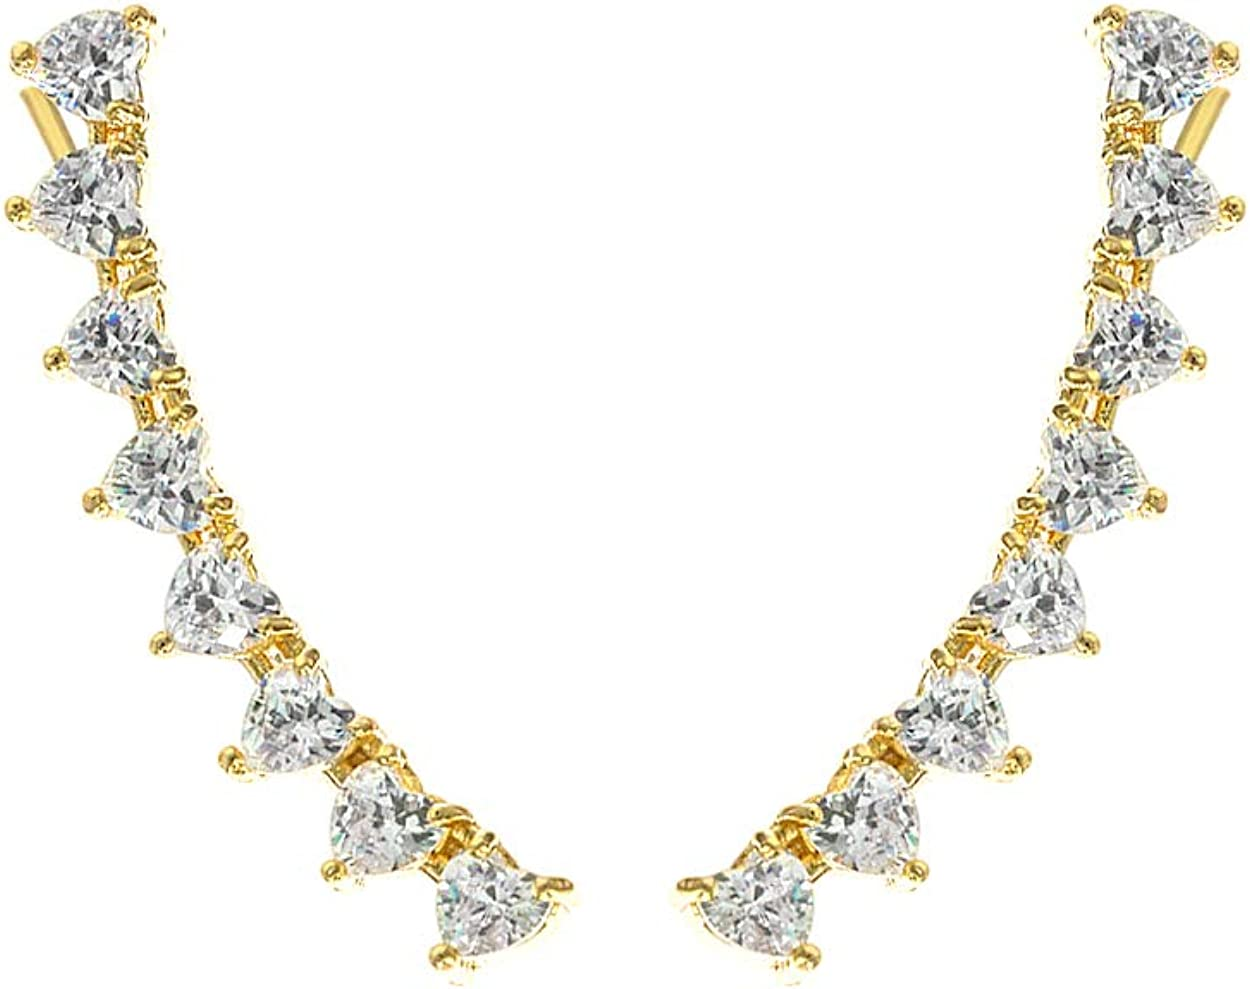 Azure NYC 14K Gold Plated Heart Shaped Cubic Zirconia Ear Crawler - Cuff Earrings Hypoallergenic Stud Ear Climber Jackets